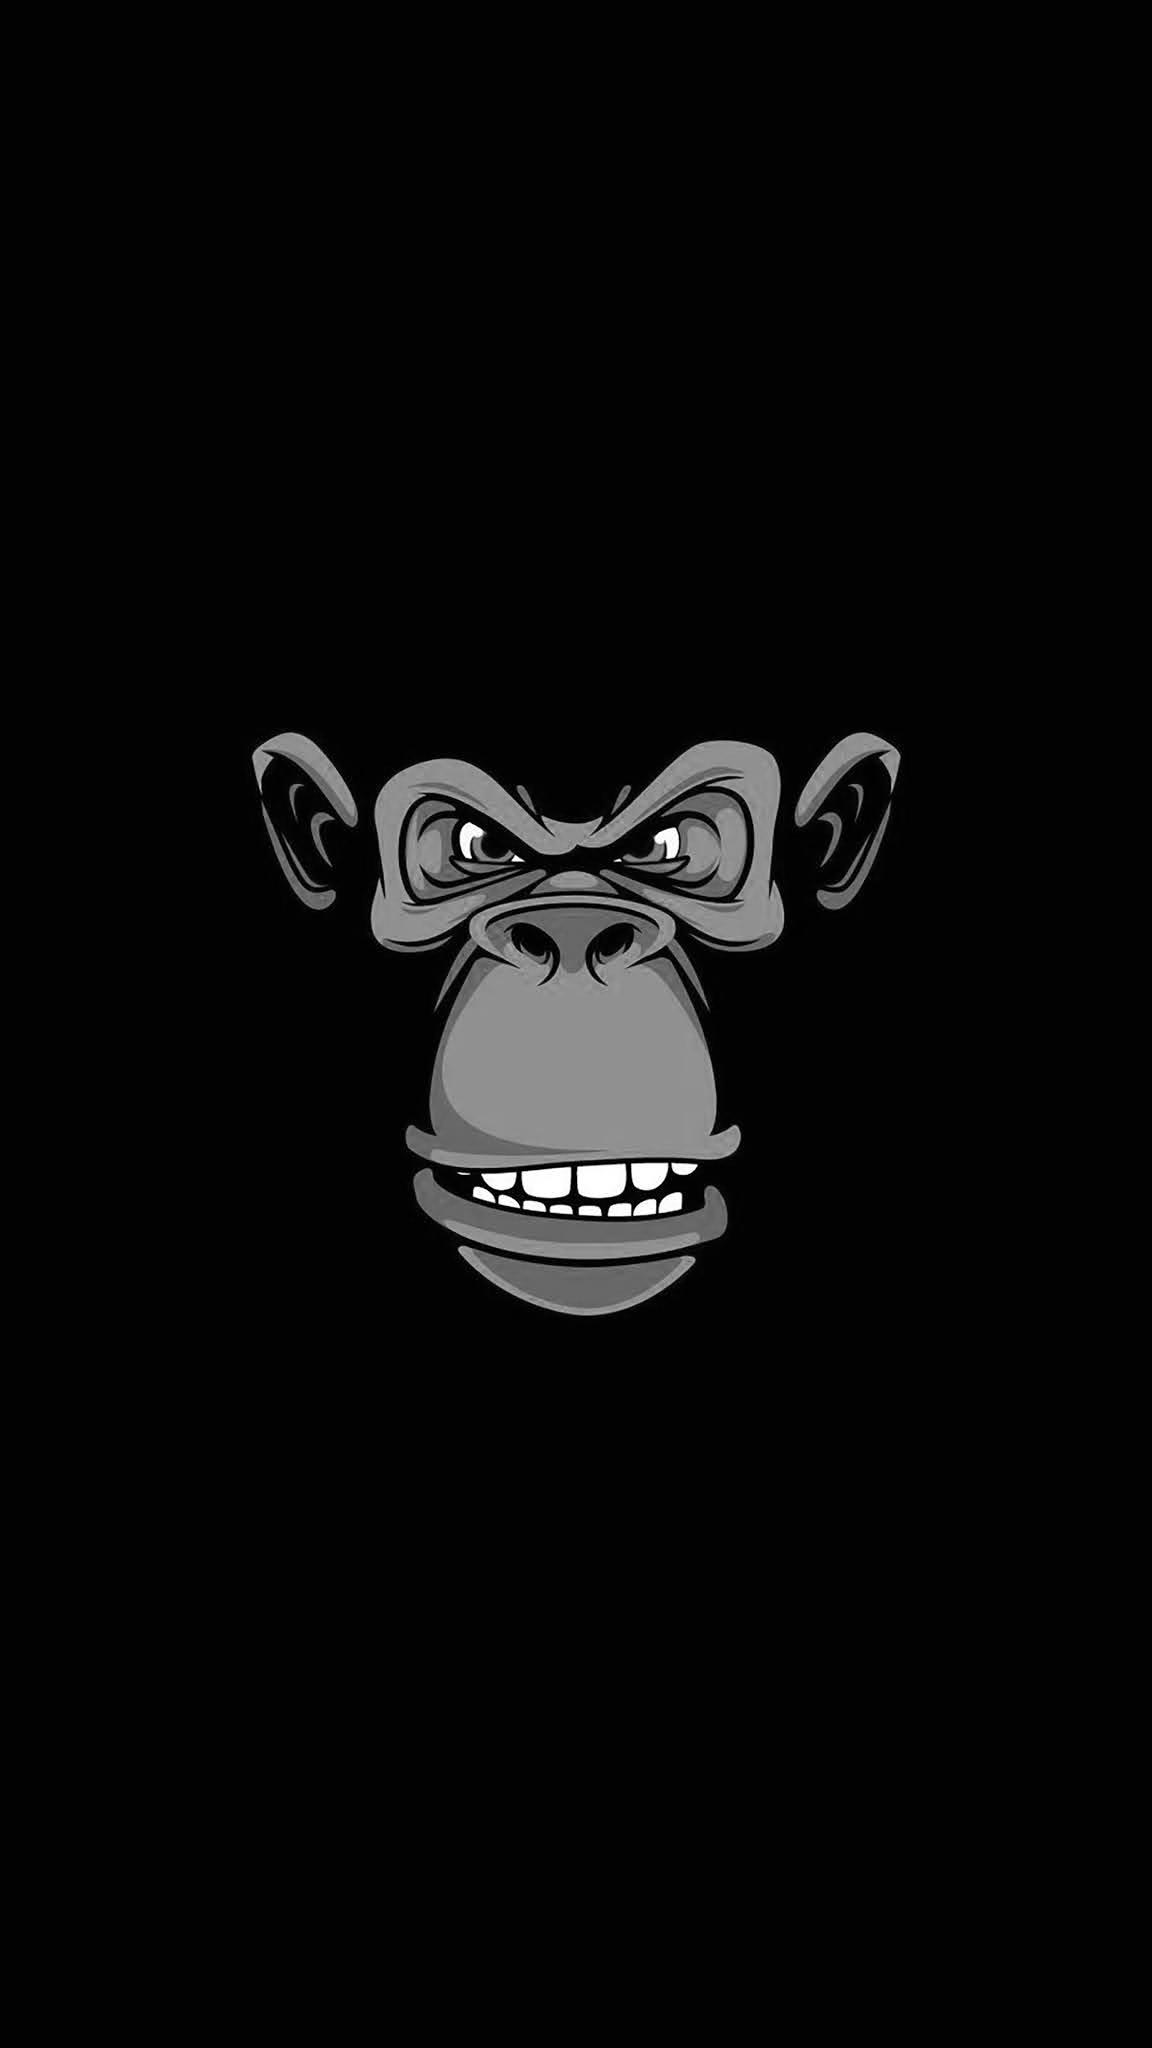 ape minimal mobile wallpaper